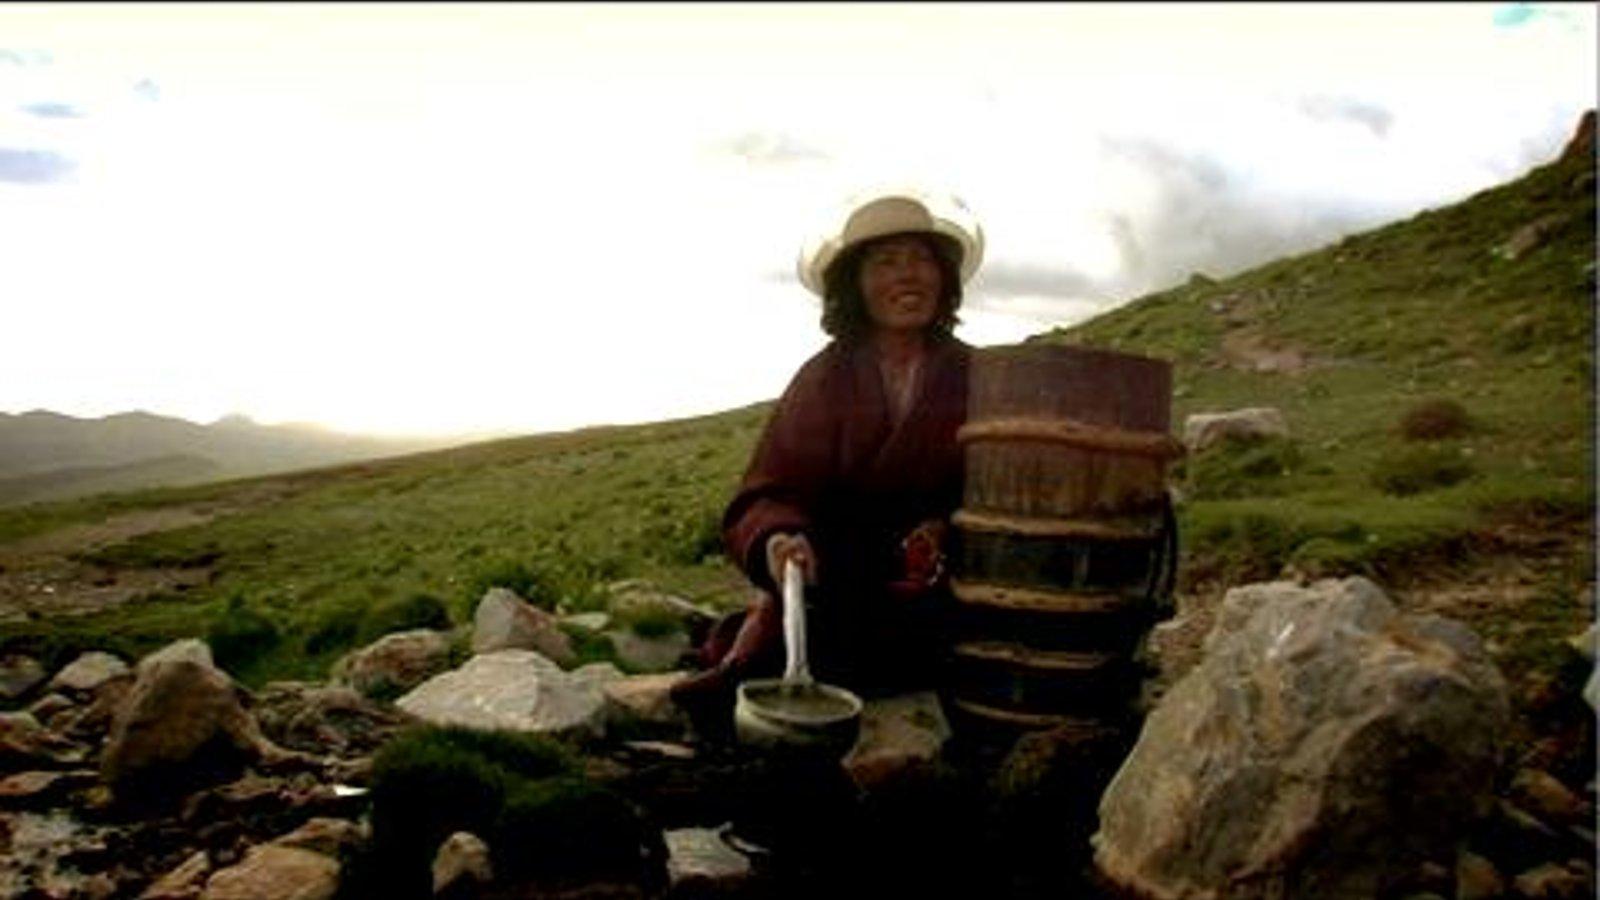 Nangchen Shorts - Rural Life in Tibet